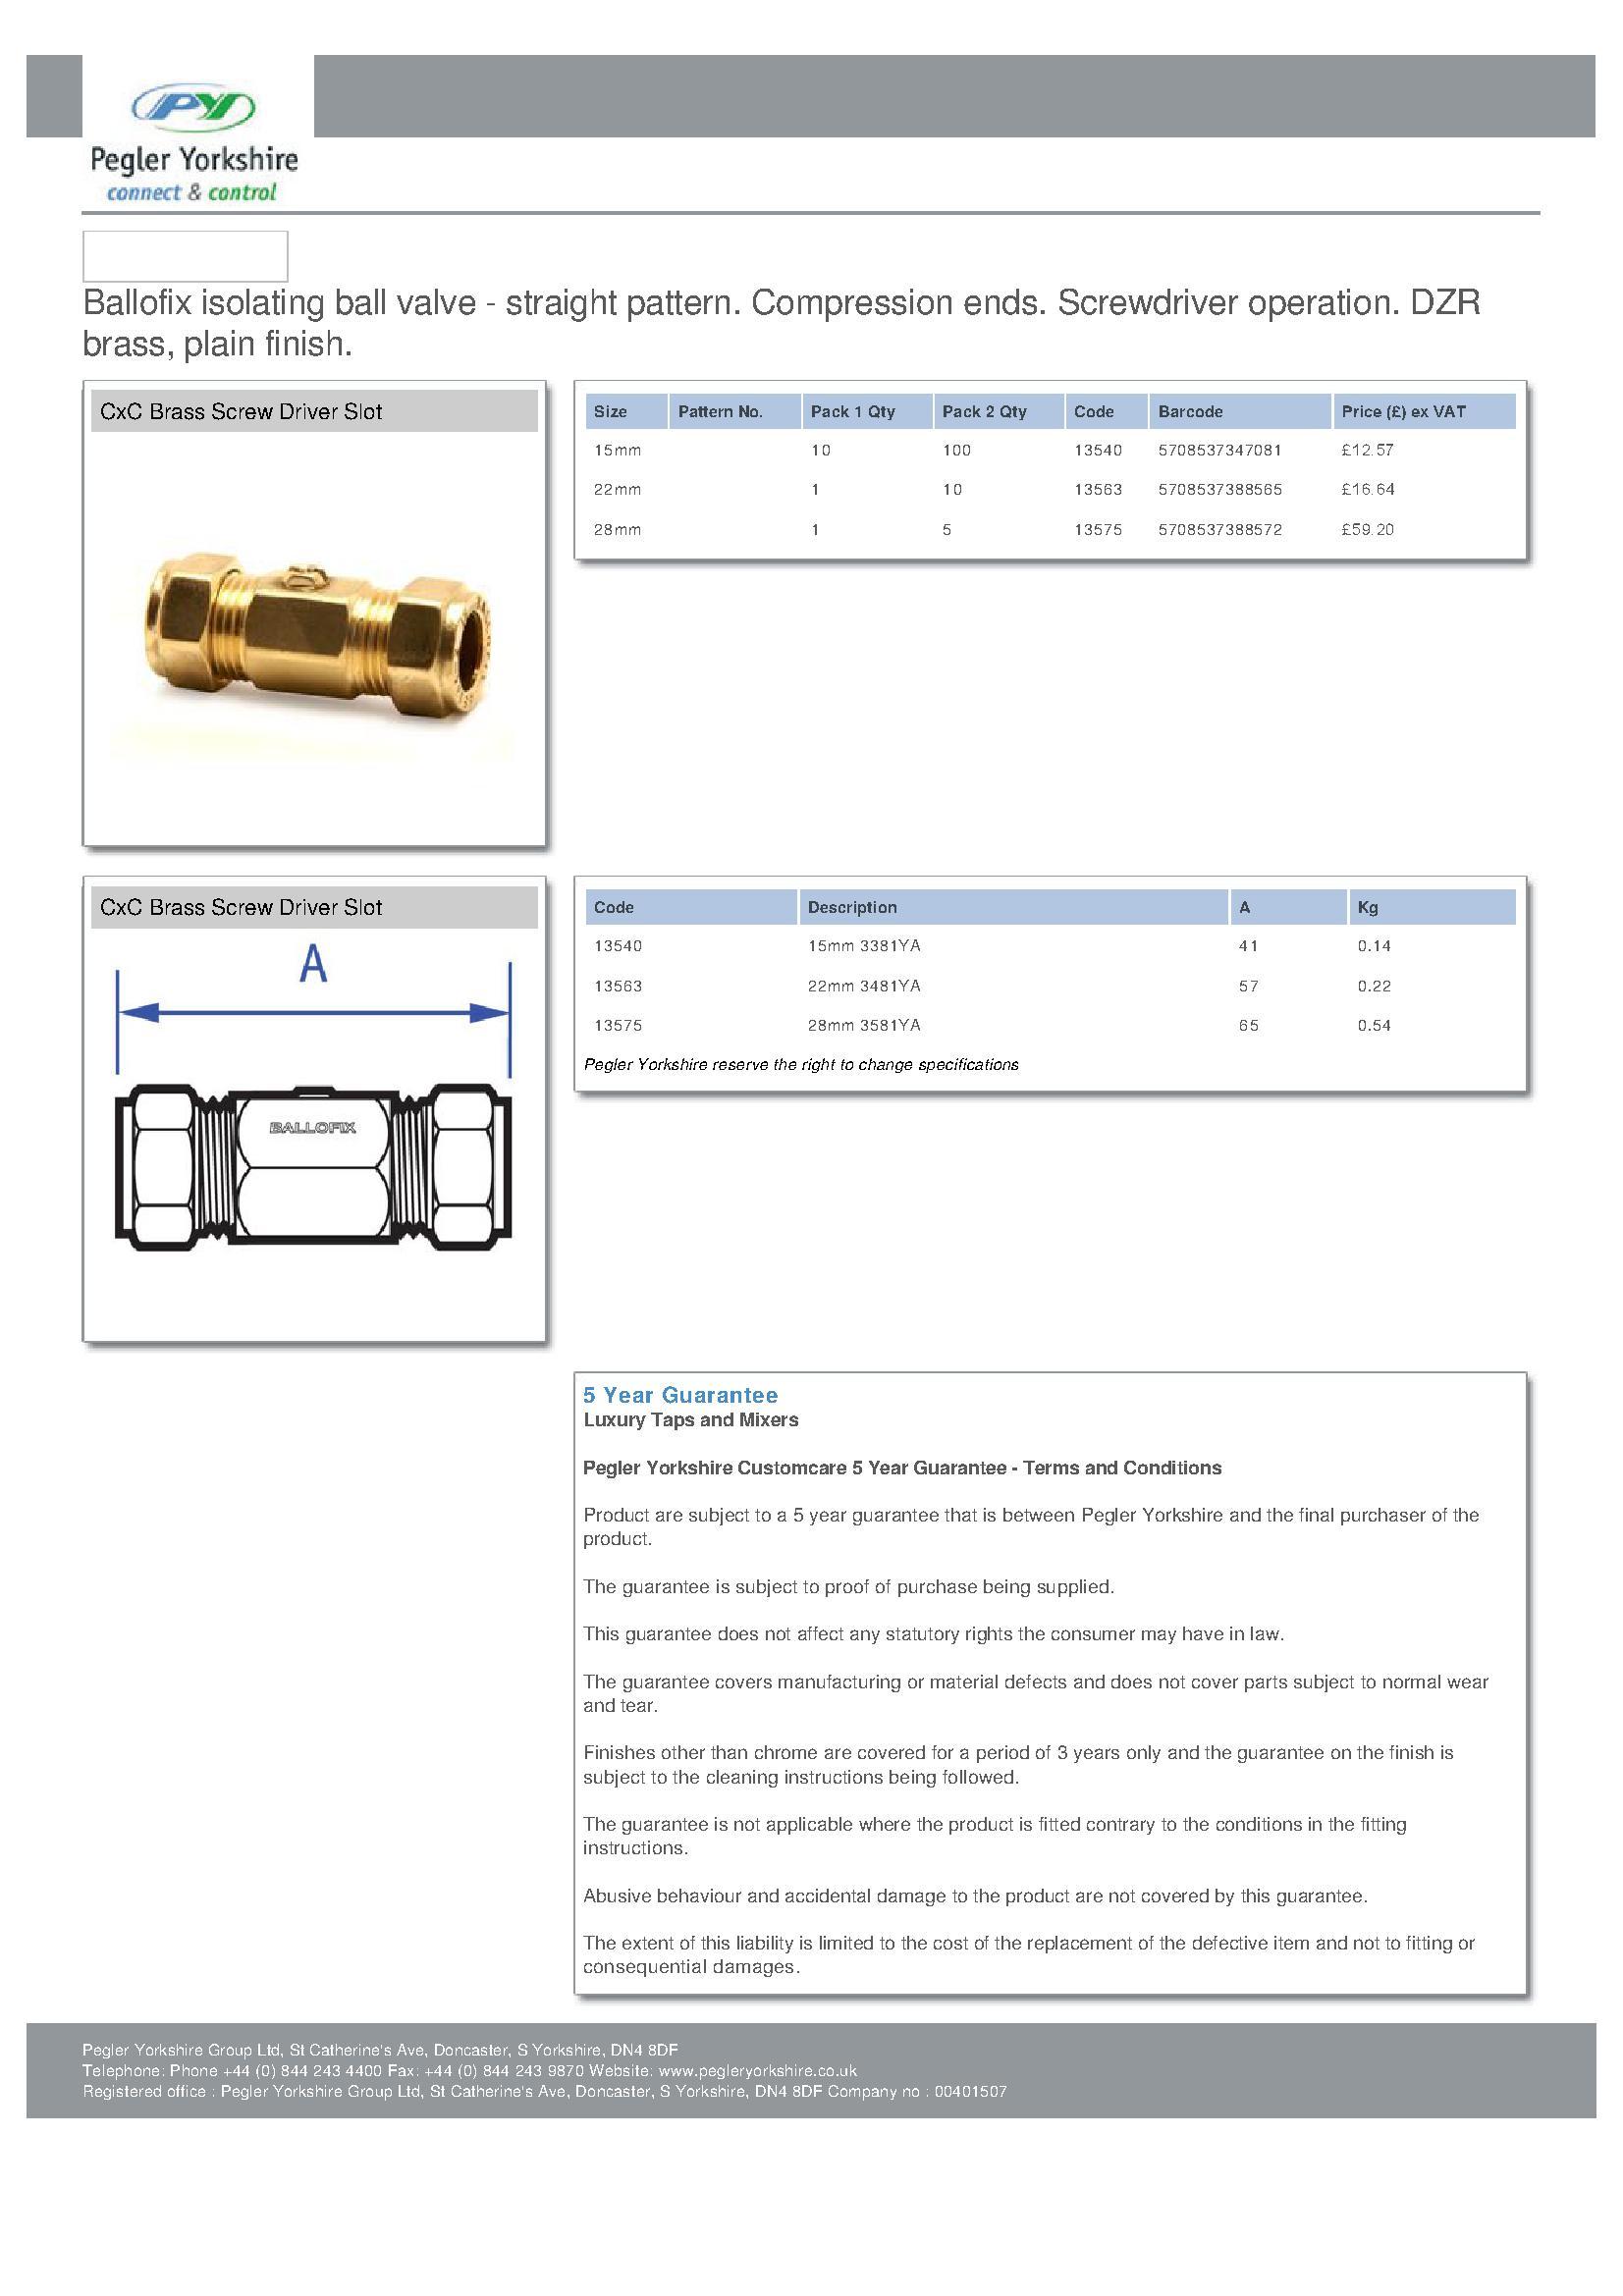 Ballofix 3581YA 28mm Copper TO Copper Brass PDF